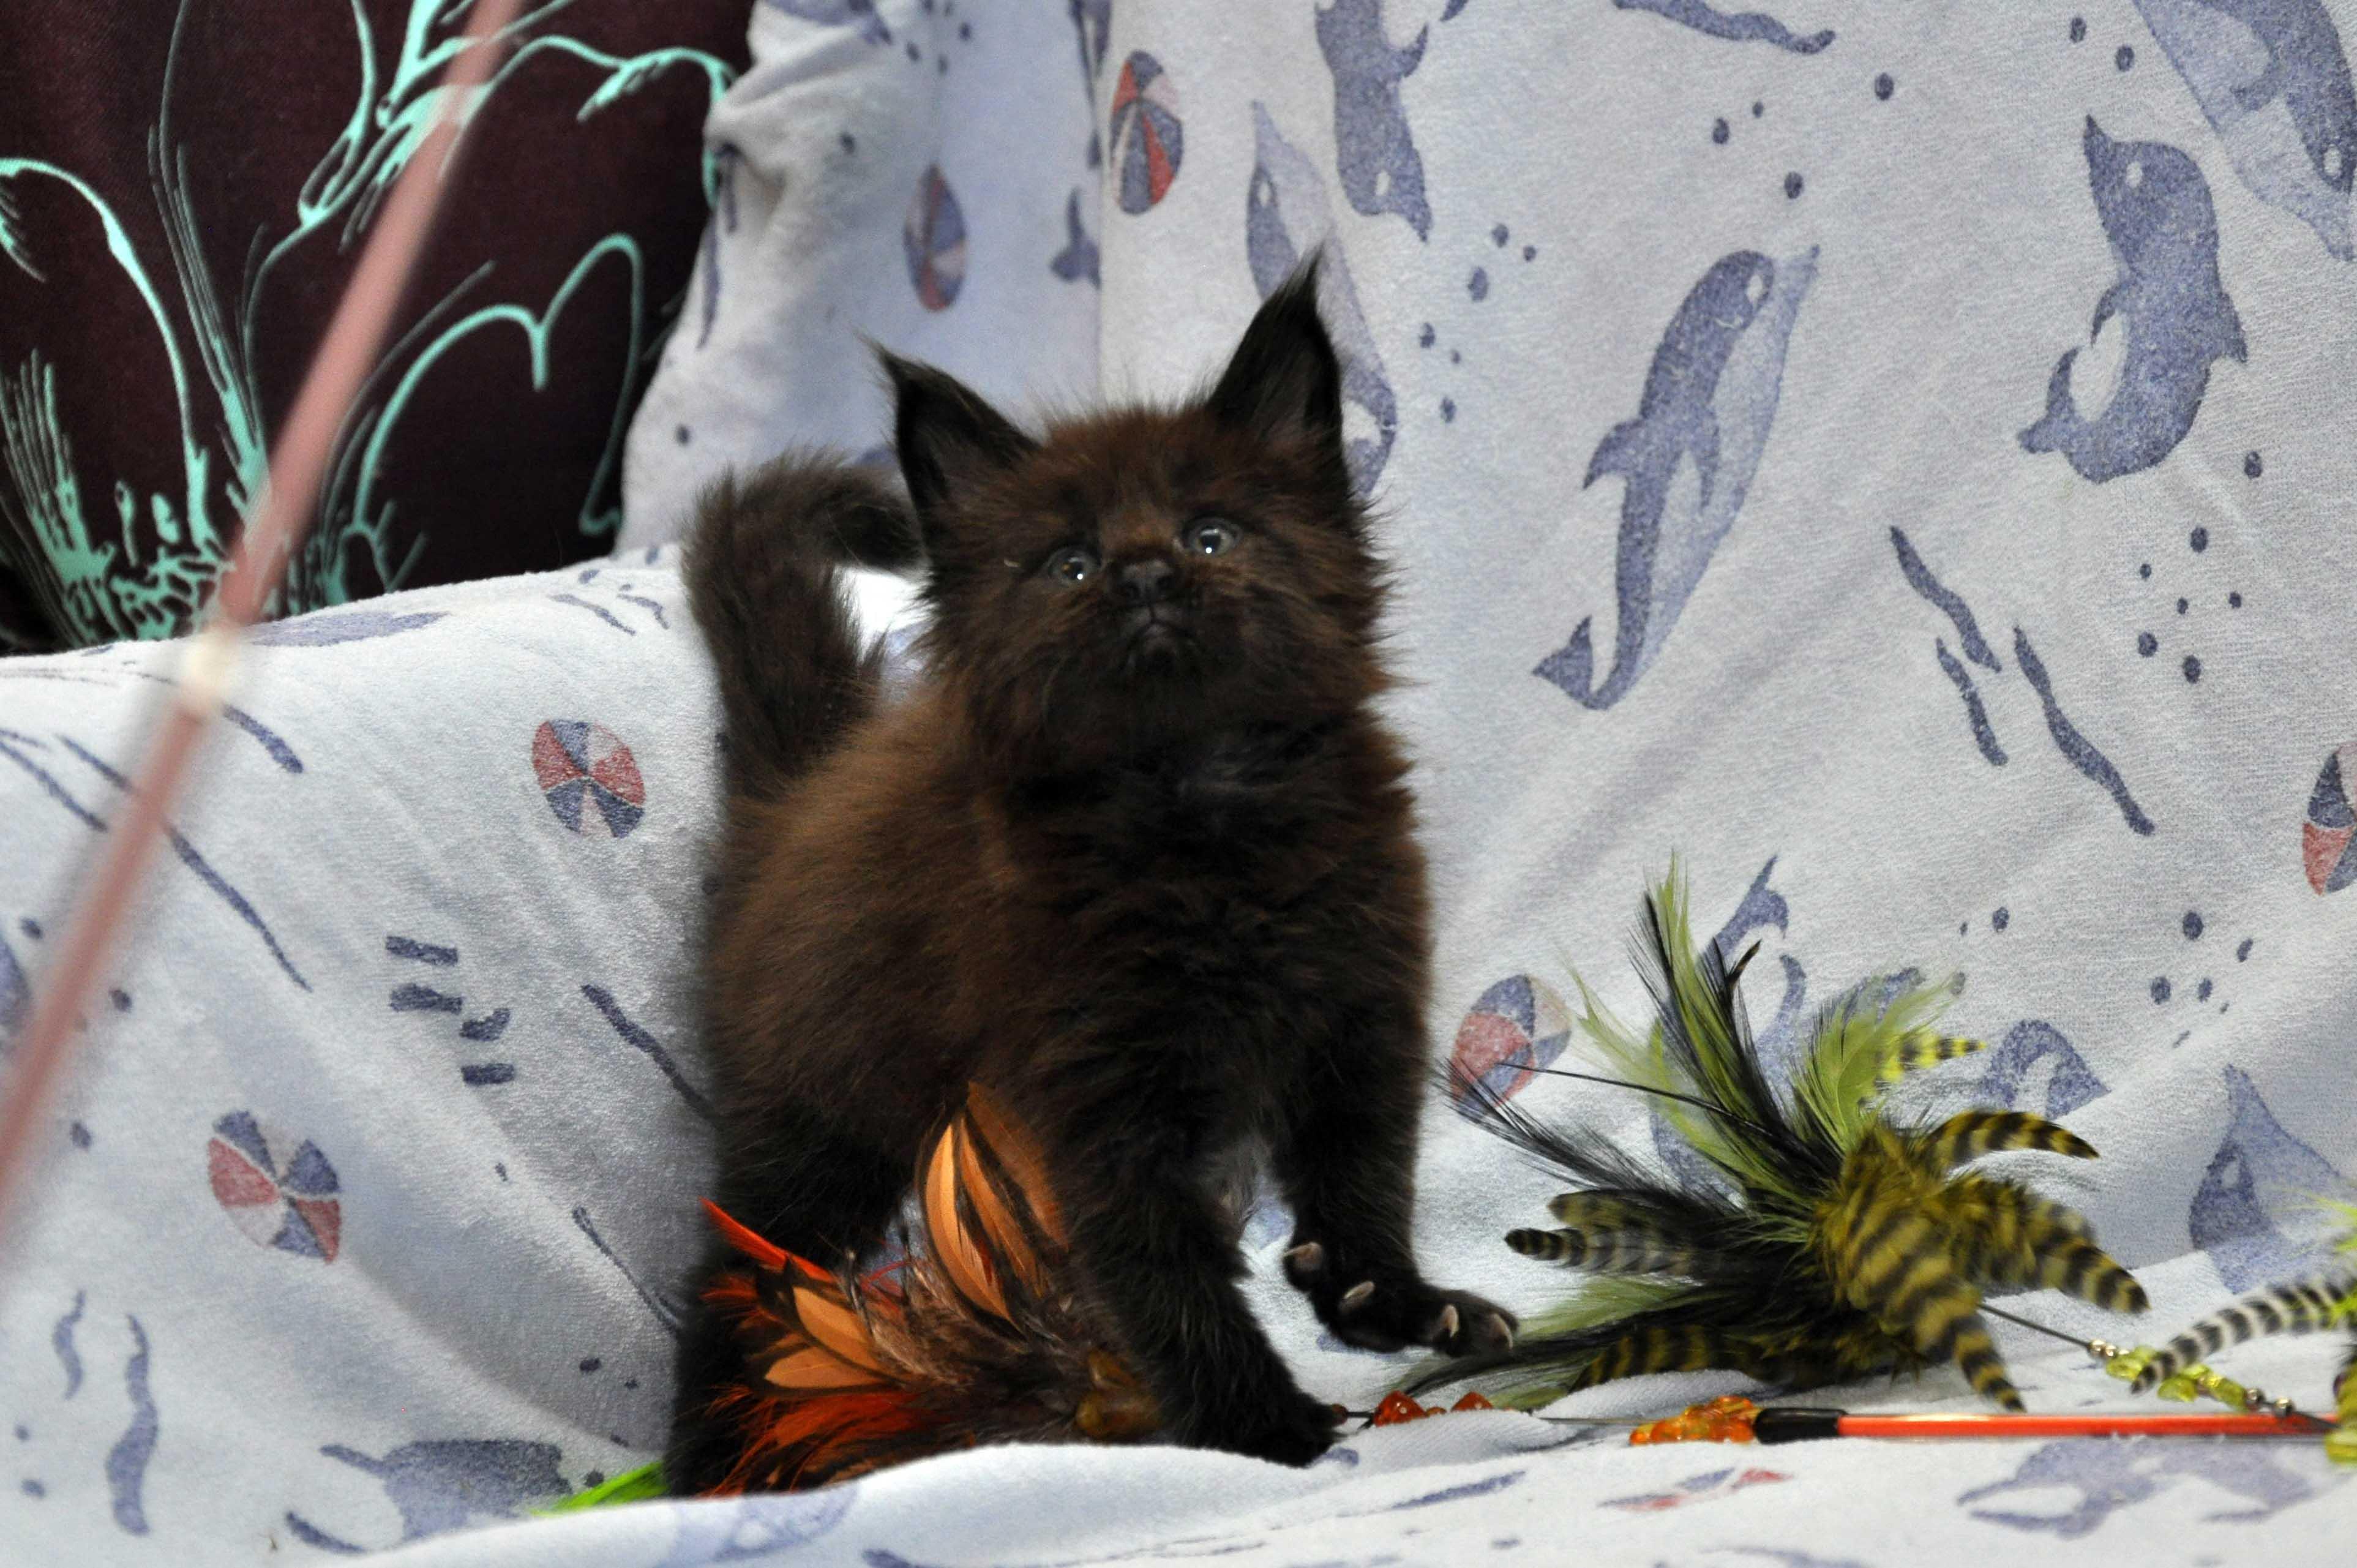 Кот Мейн Кун 3 (male) Eyktan QUAKE фото 10